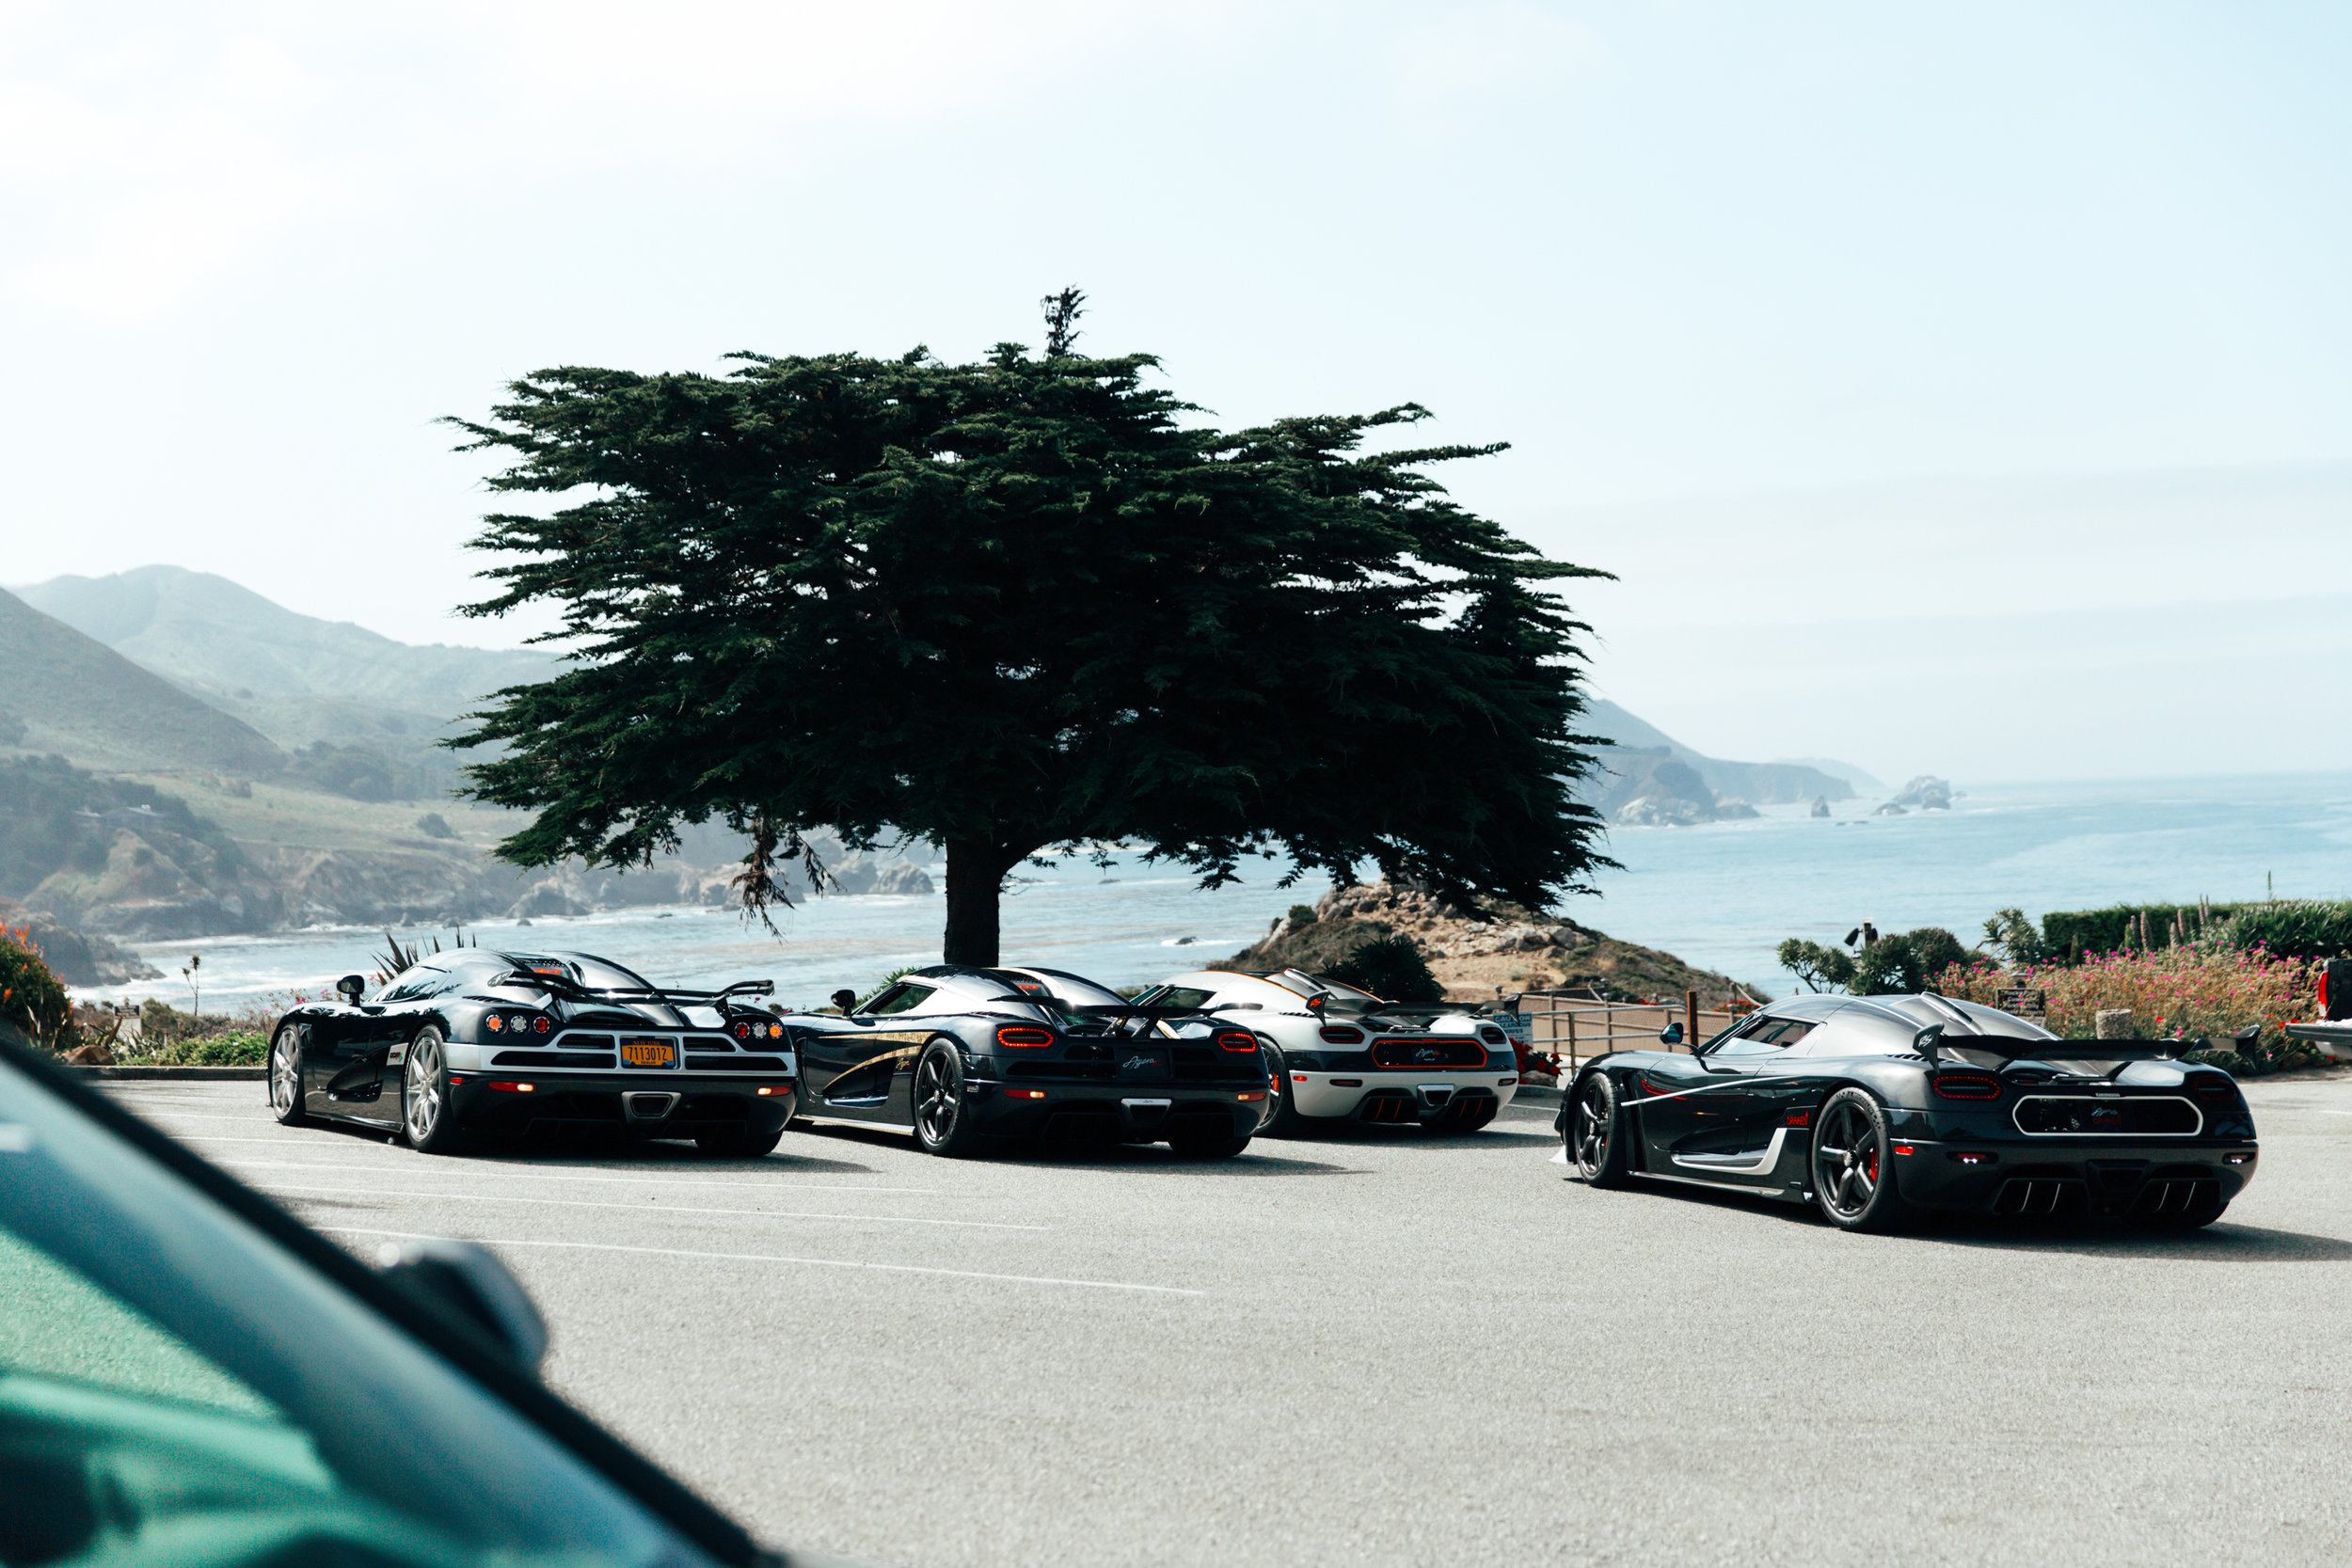 Stay_Driven_Monterey_Car_Week_Koenigsegg-50.jpg